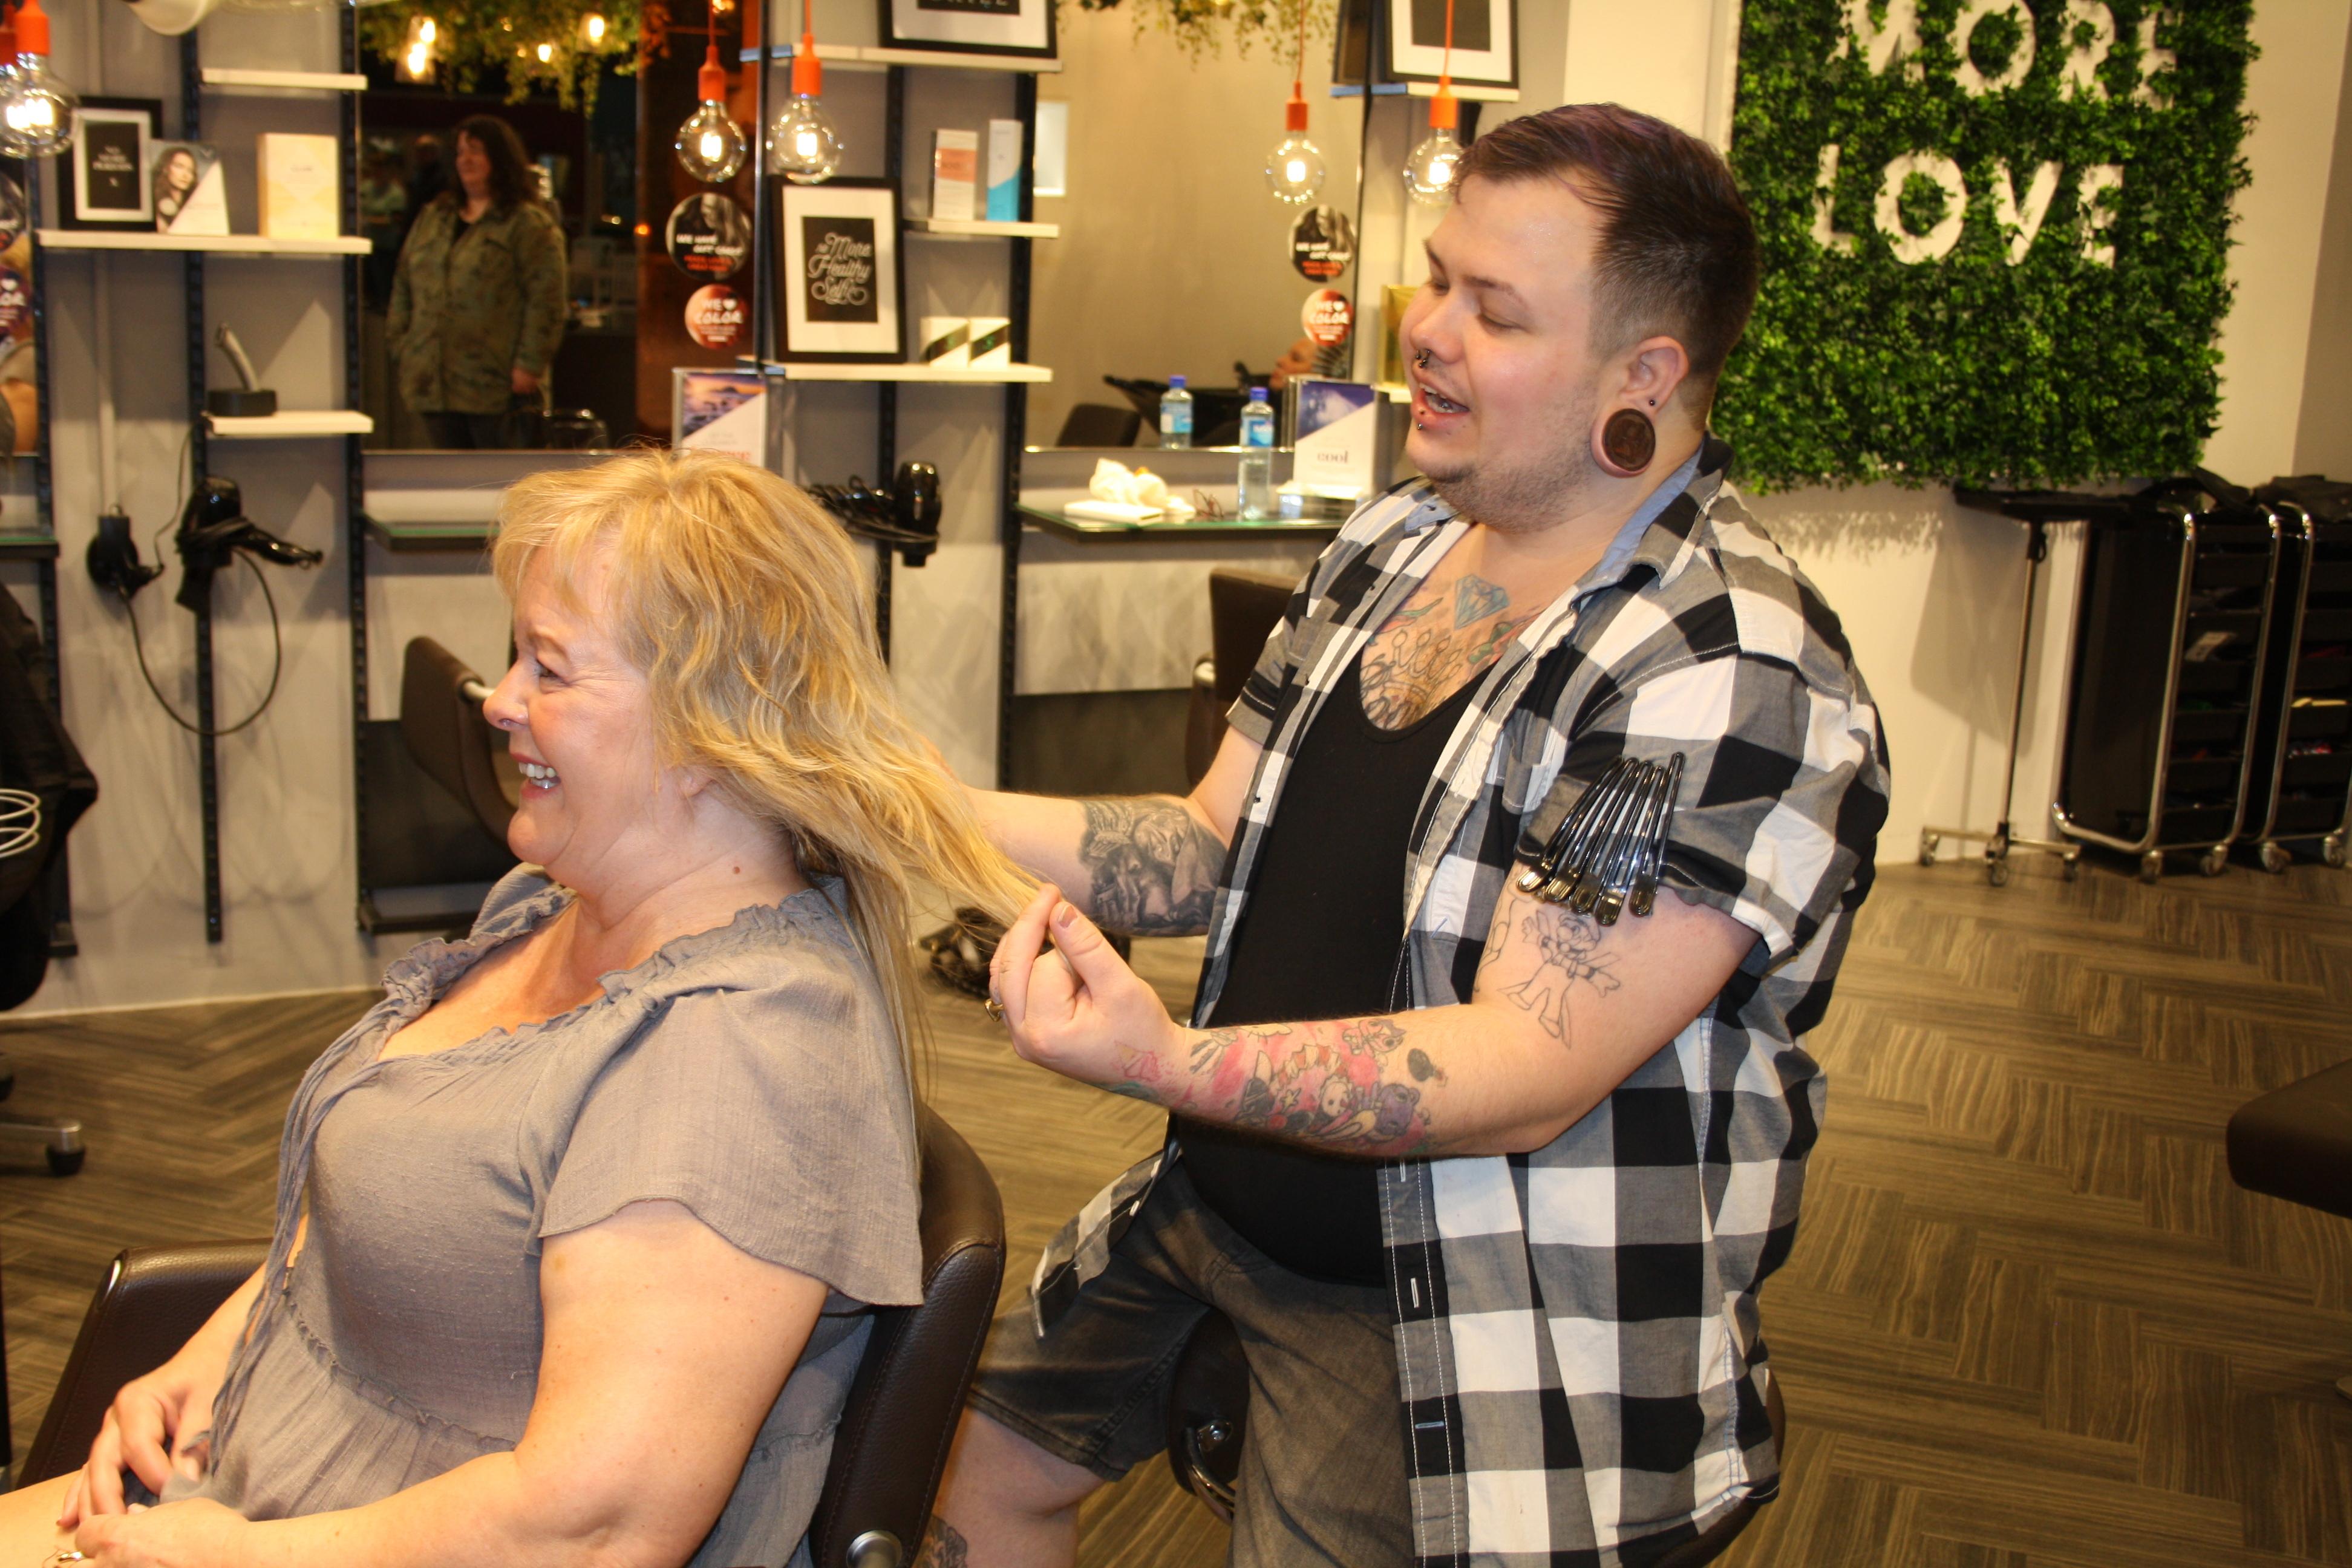 Dame hos mannlig frisør